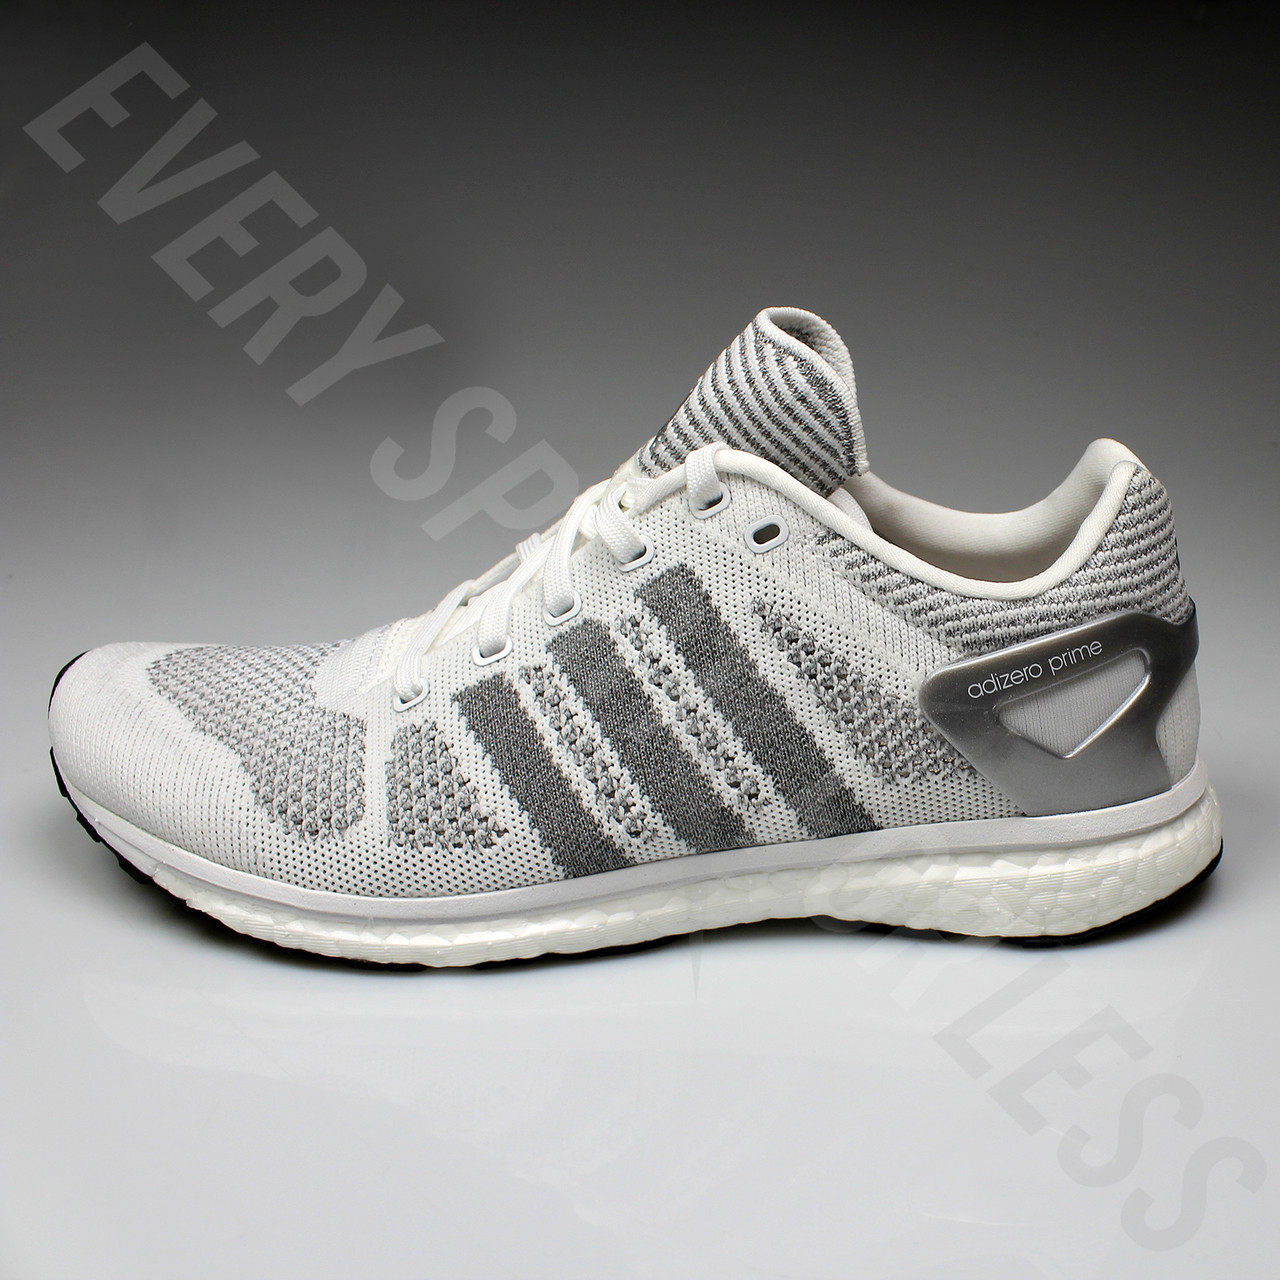 buy popular 20df2 37772 ... Adidas Adizero Primeknit Limited Edition Mens Running Shoes BB4919 ...